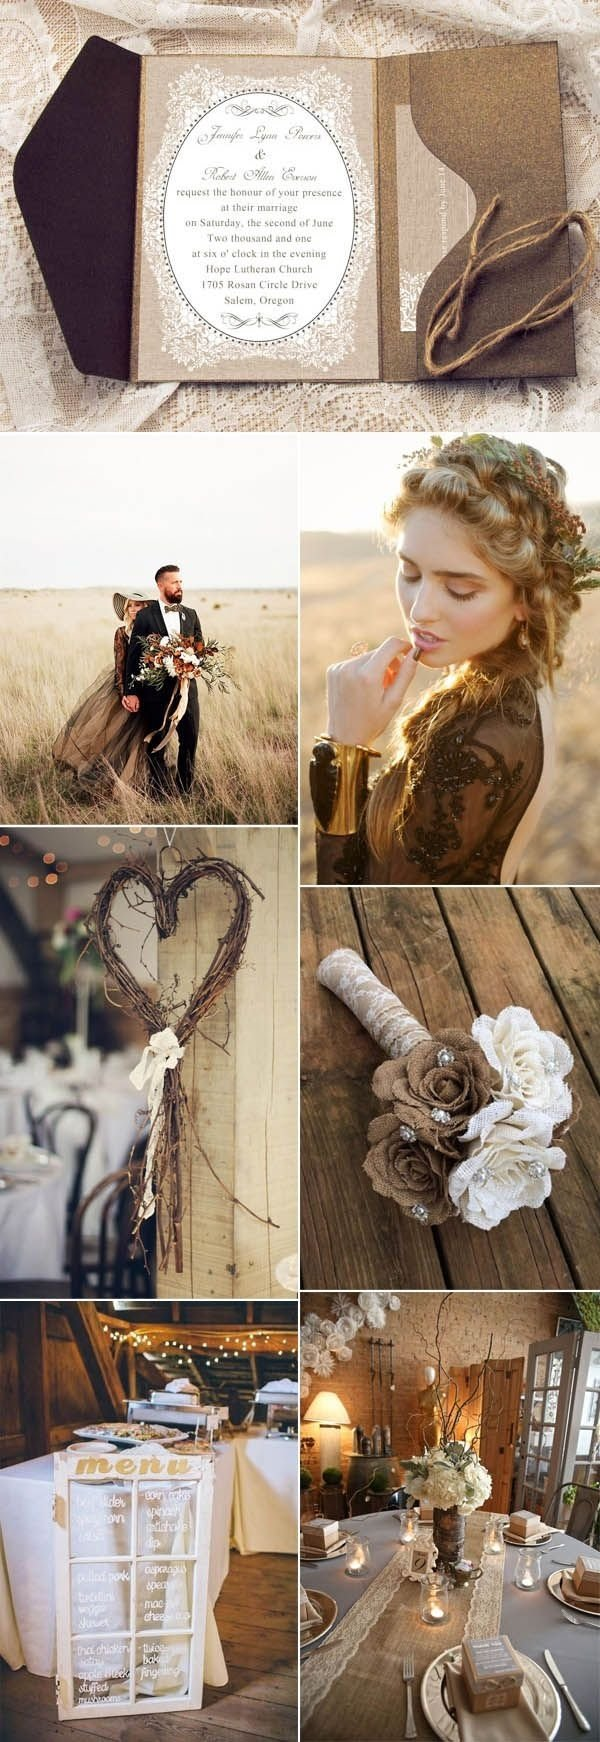 10 Stylish Vintage Wedding Ideas For Fall 368 best fall wedding ideas images on pinterest dream wedding 2020